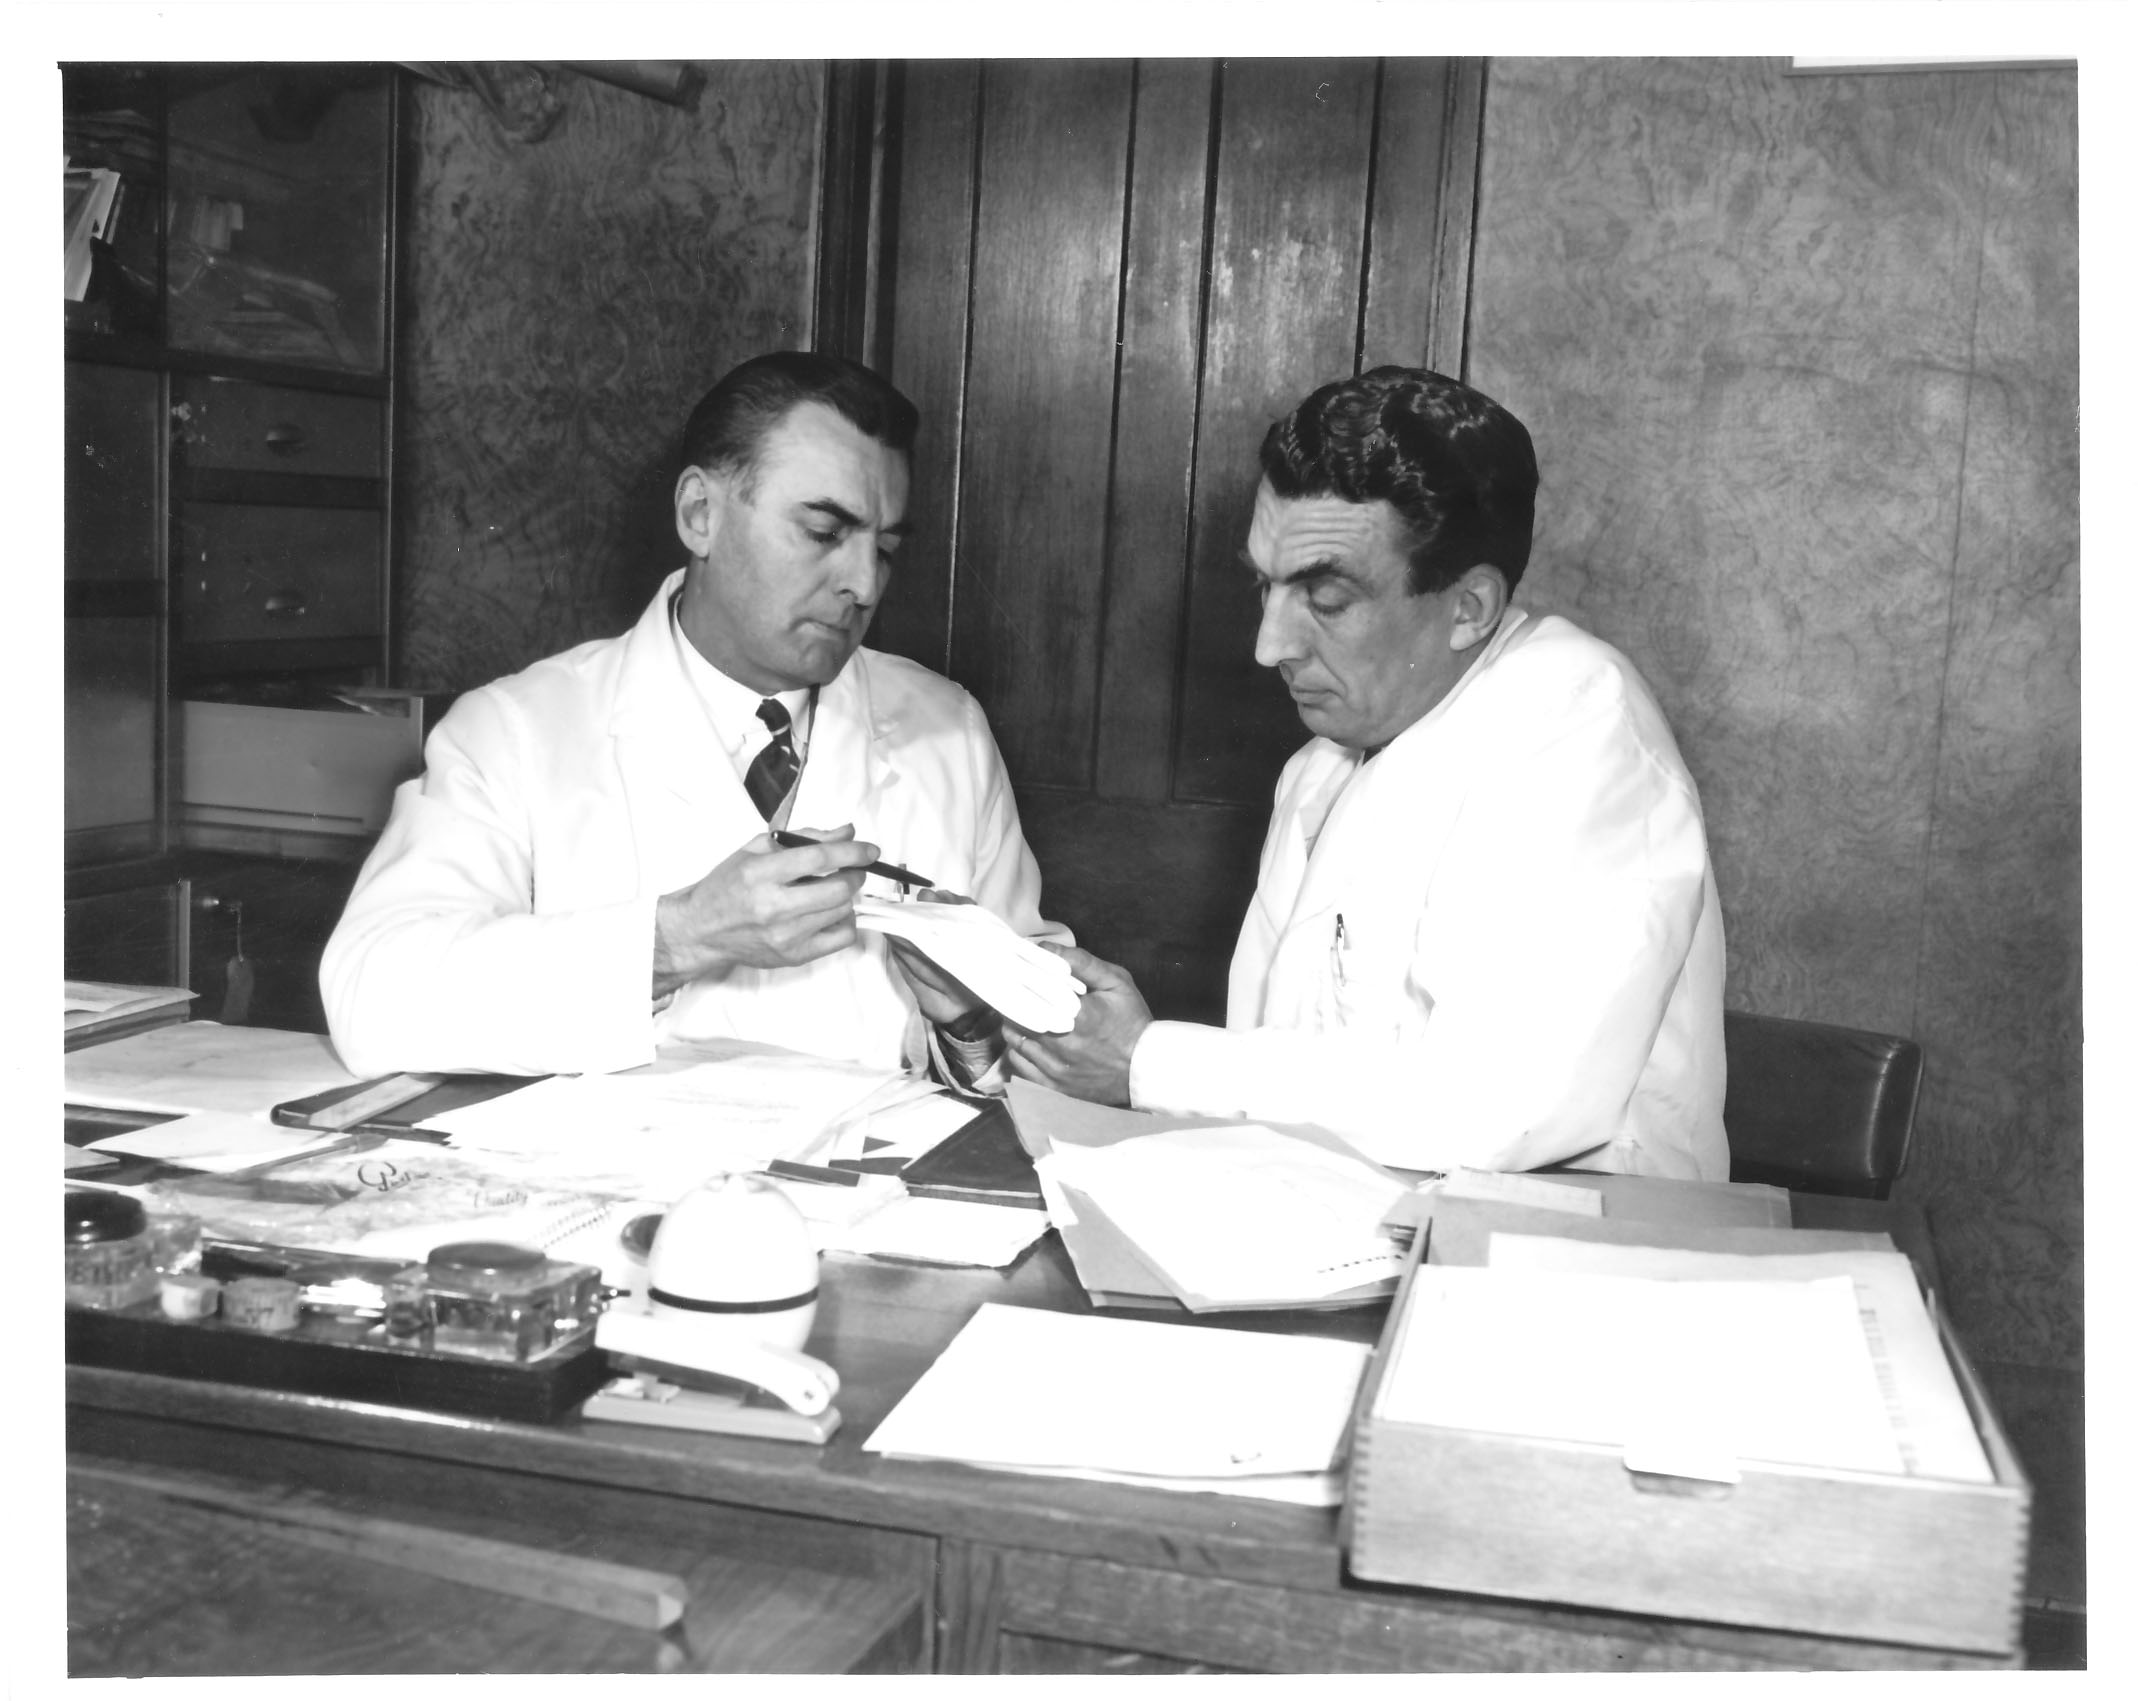 Richard & John 1960